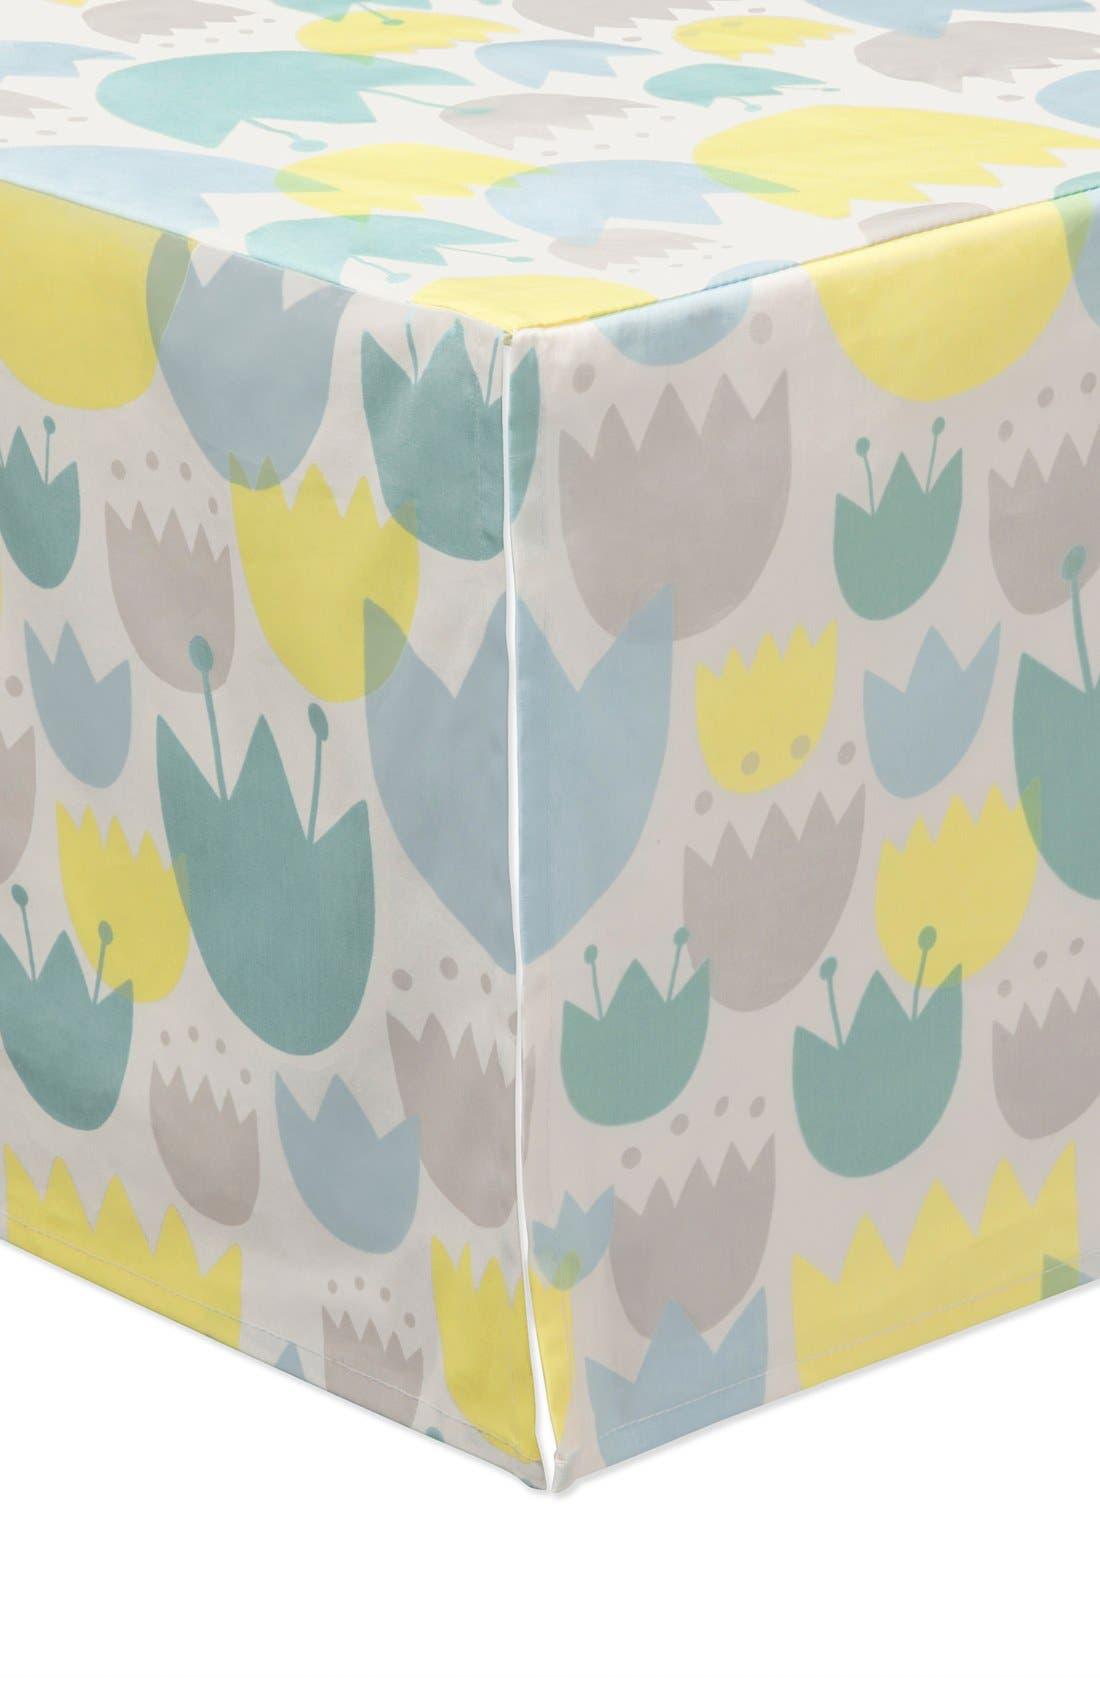 'Garden' Crib Sheet, Crib Skirt, Stroller Blanket & Wall Decals,                             Alternate thumbnail 3, color,                             Blue